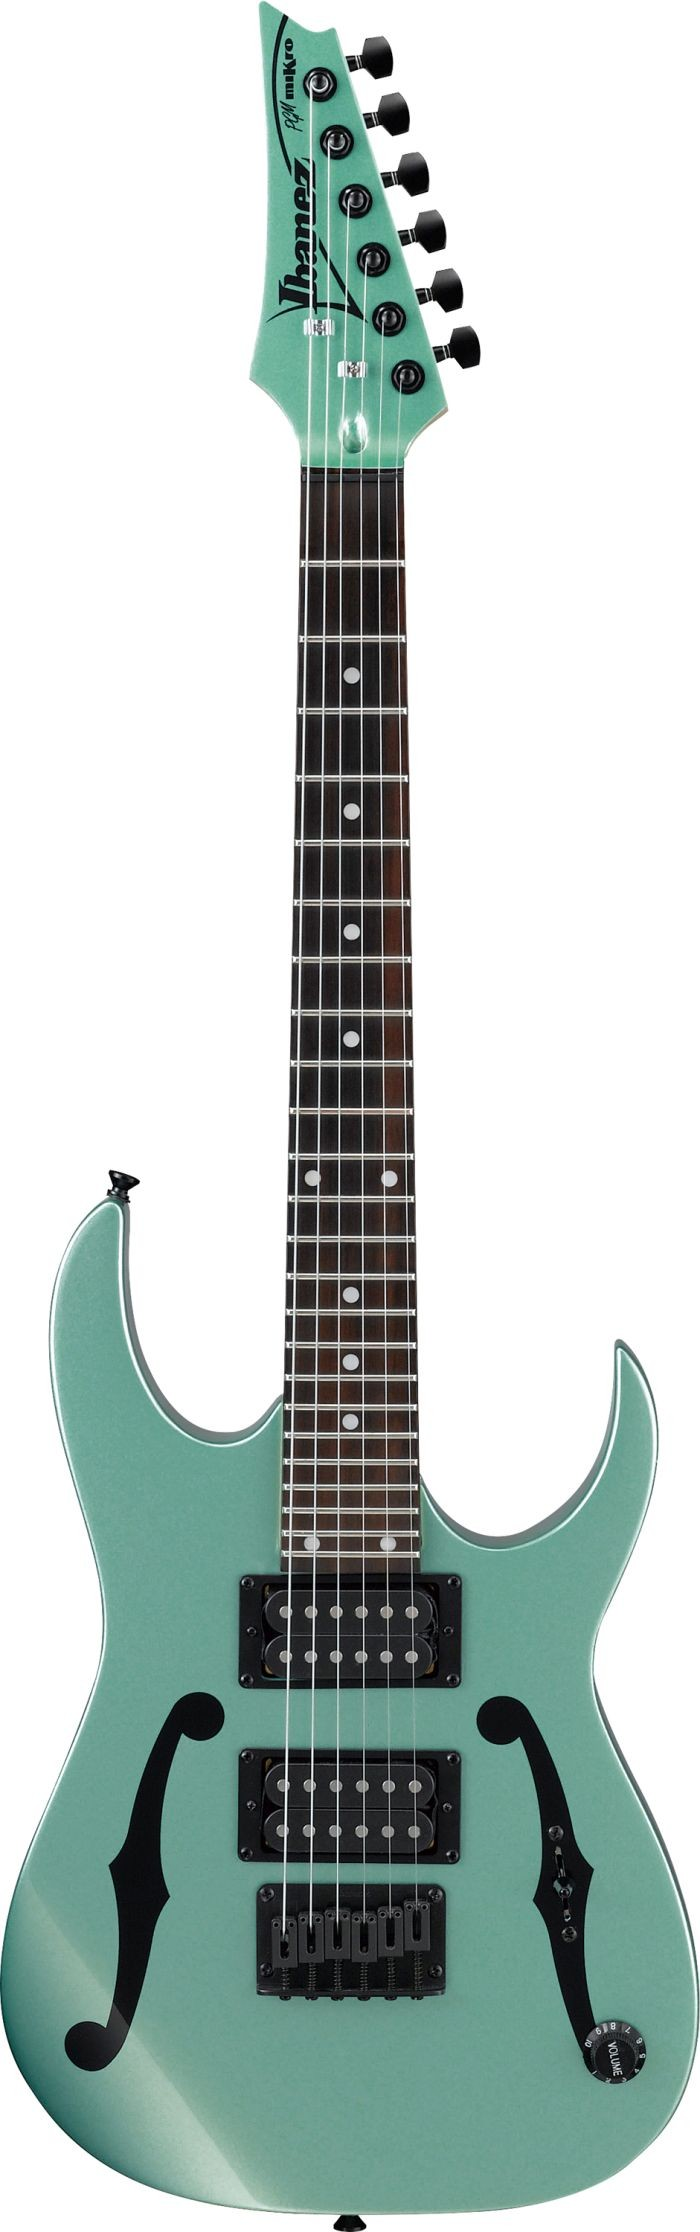 ibanez pgmm21 mgn electric guitar metallic light green 2019. Black Bedroom Furniture Sets. Home Design Ideas